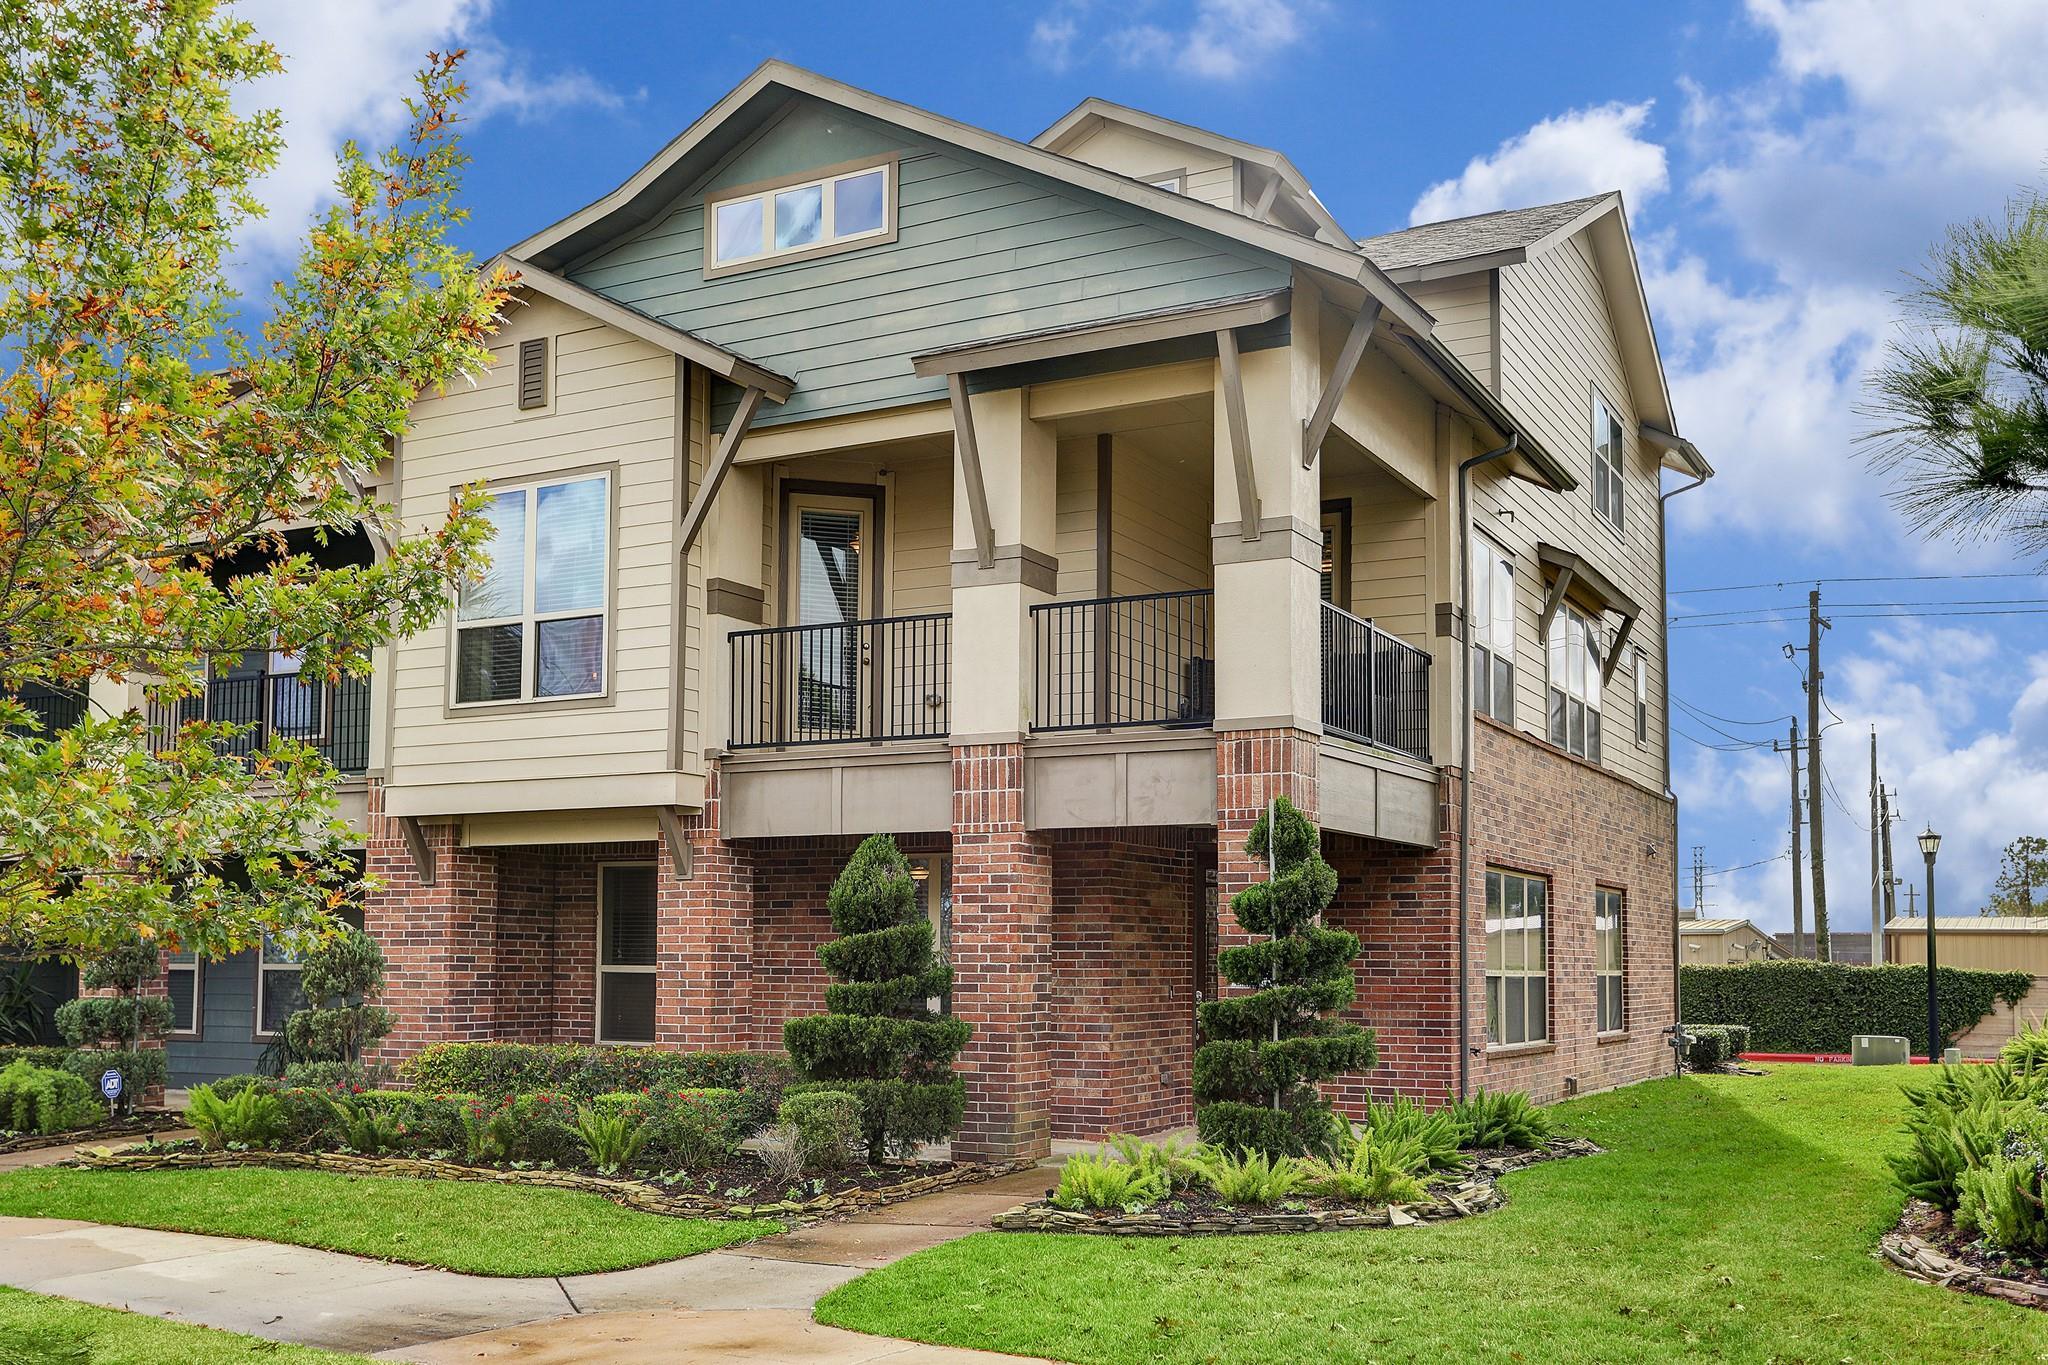 719 Via Lago Property Photo - Webster, TX real estate listing